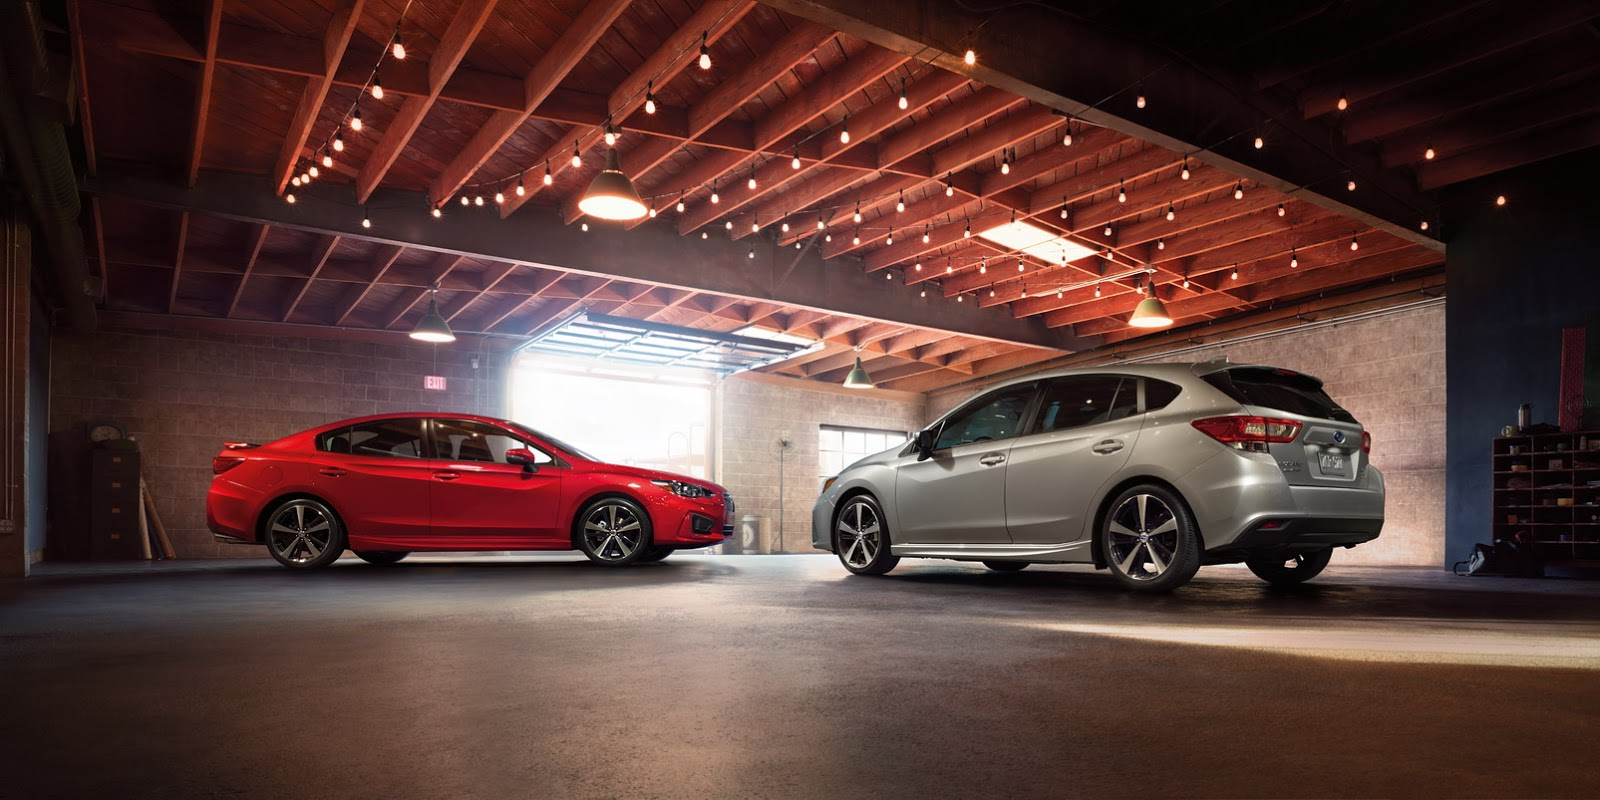 2017 Subaru Impreza New7